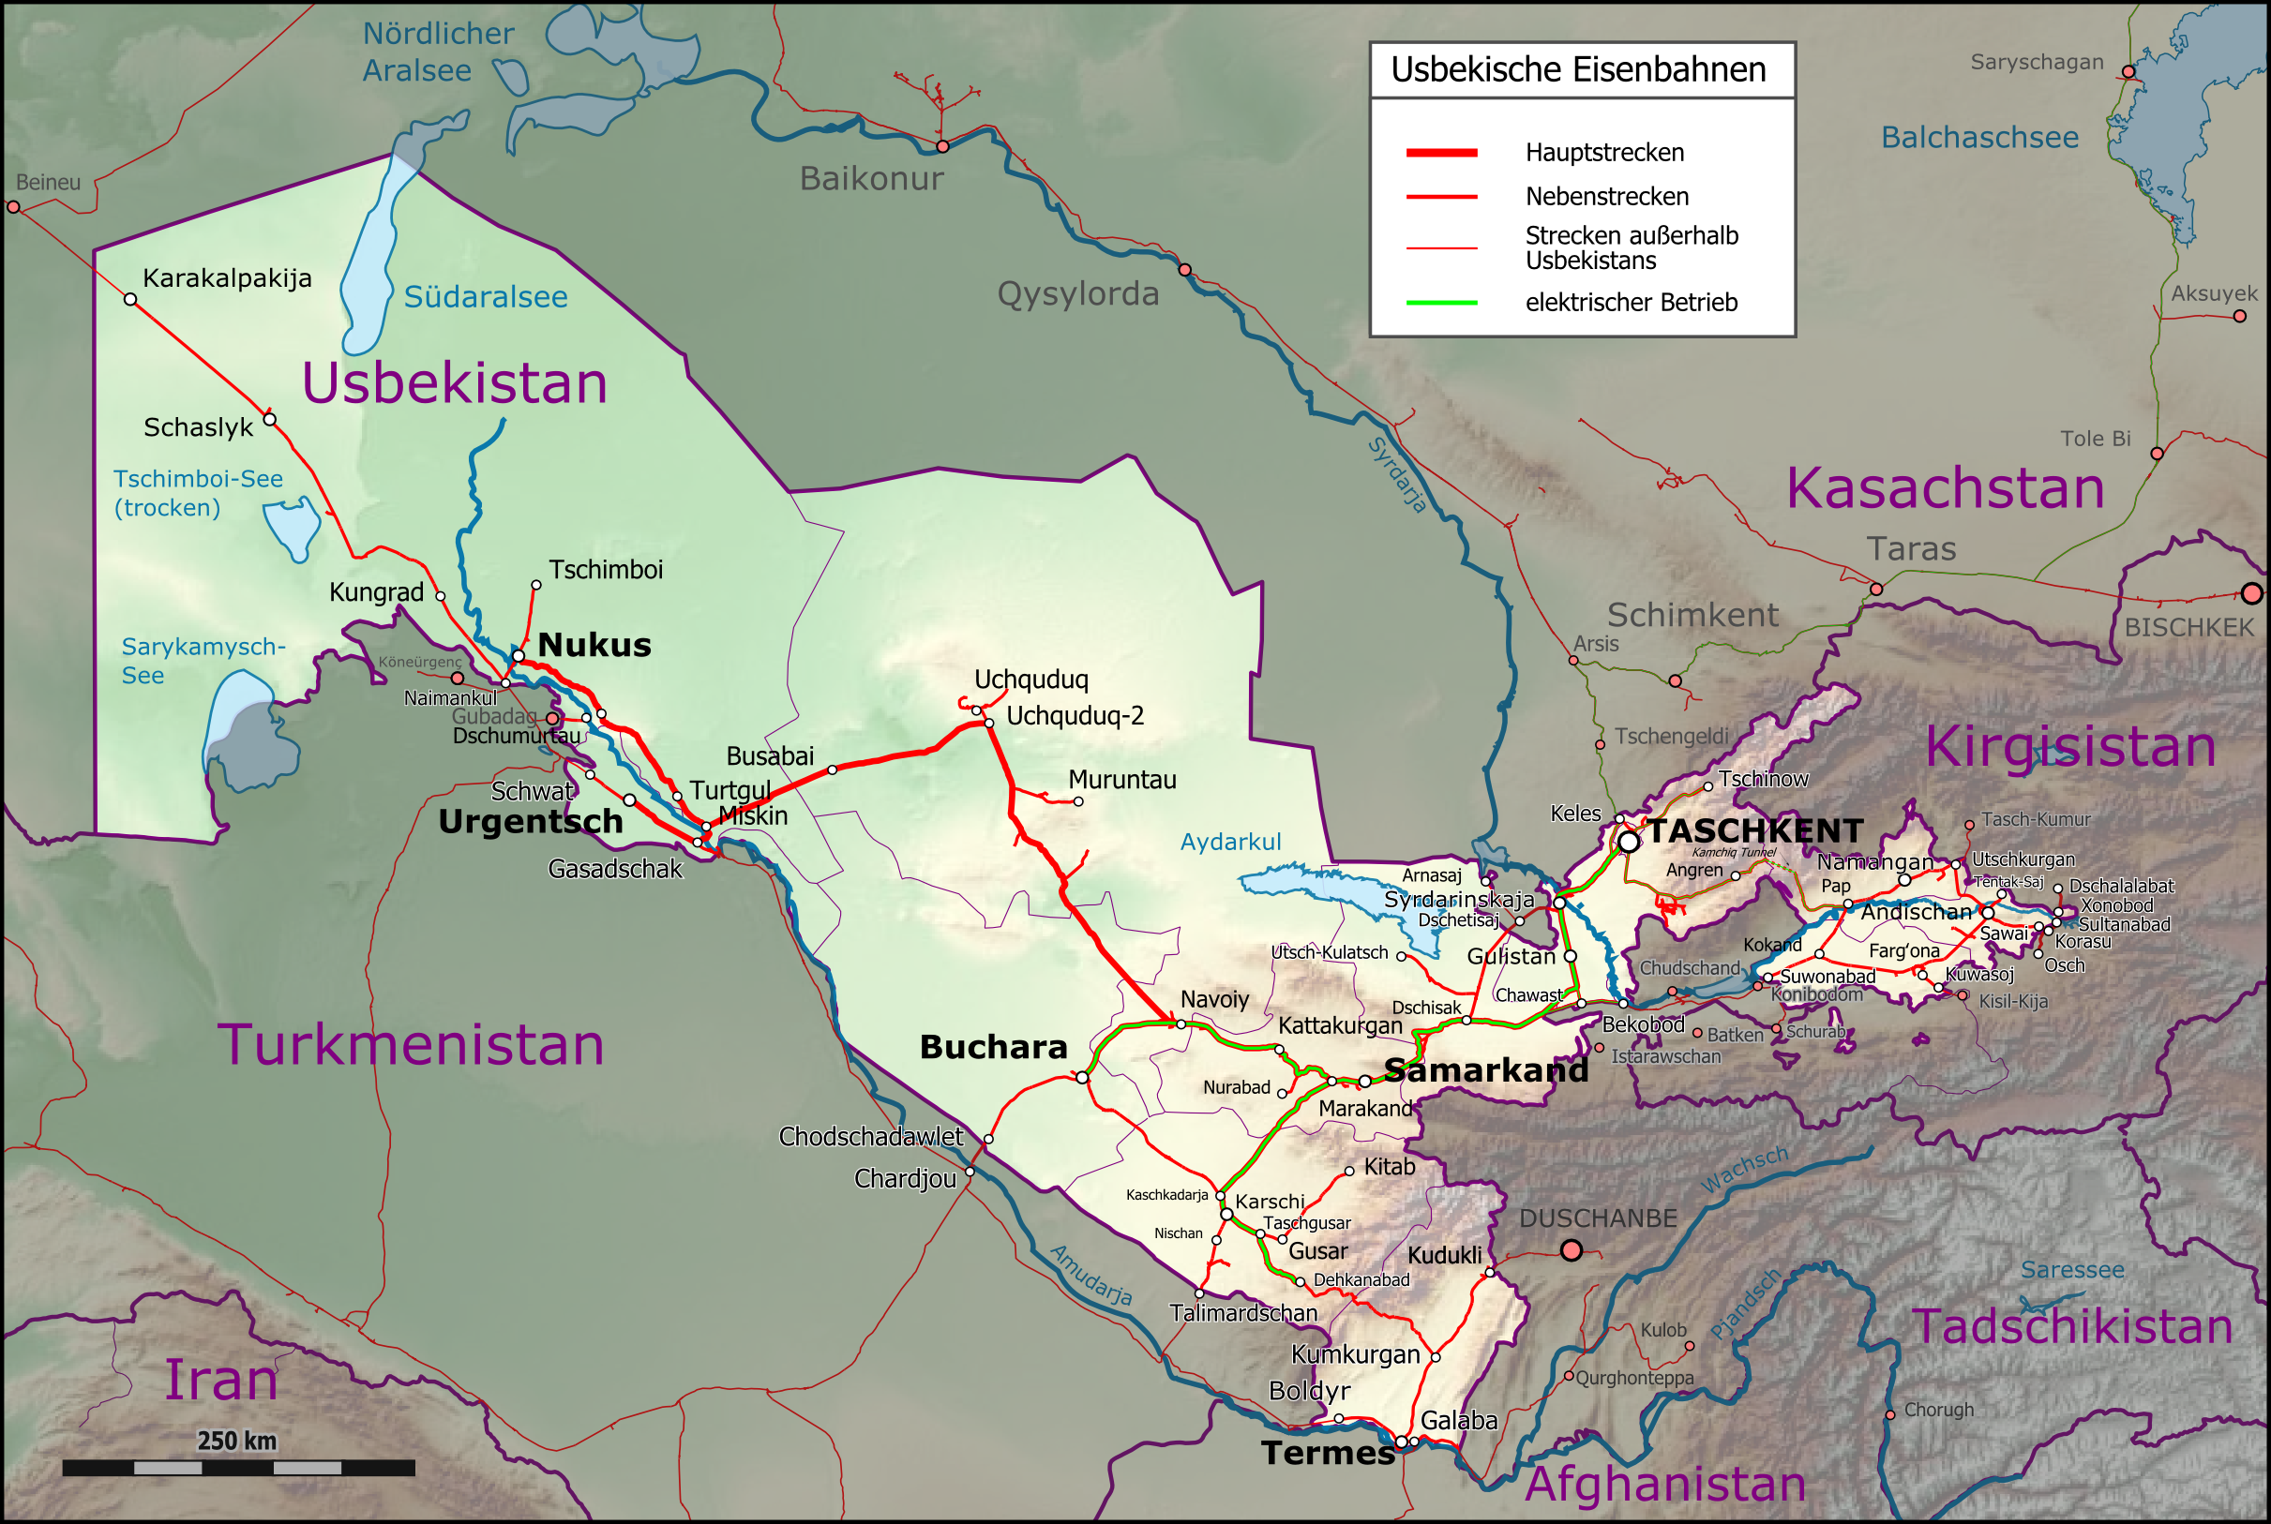 Uzbekistan Railway Networkpng UserChumwaOgreBotTransport Maps2015 April 1 10